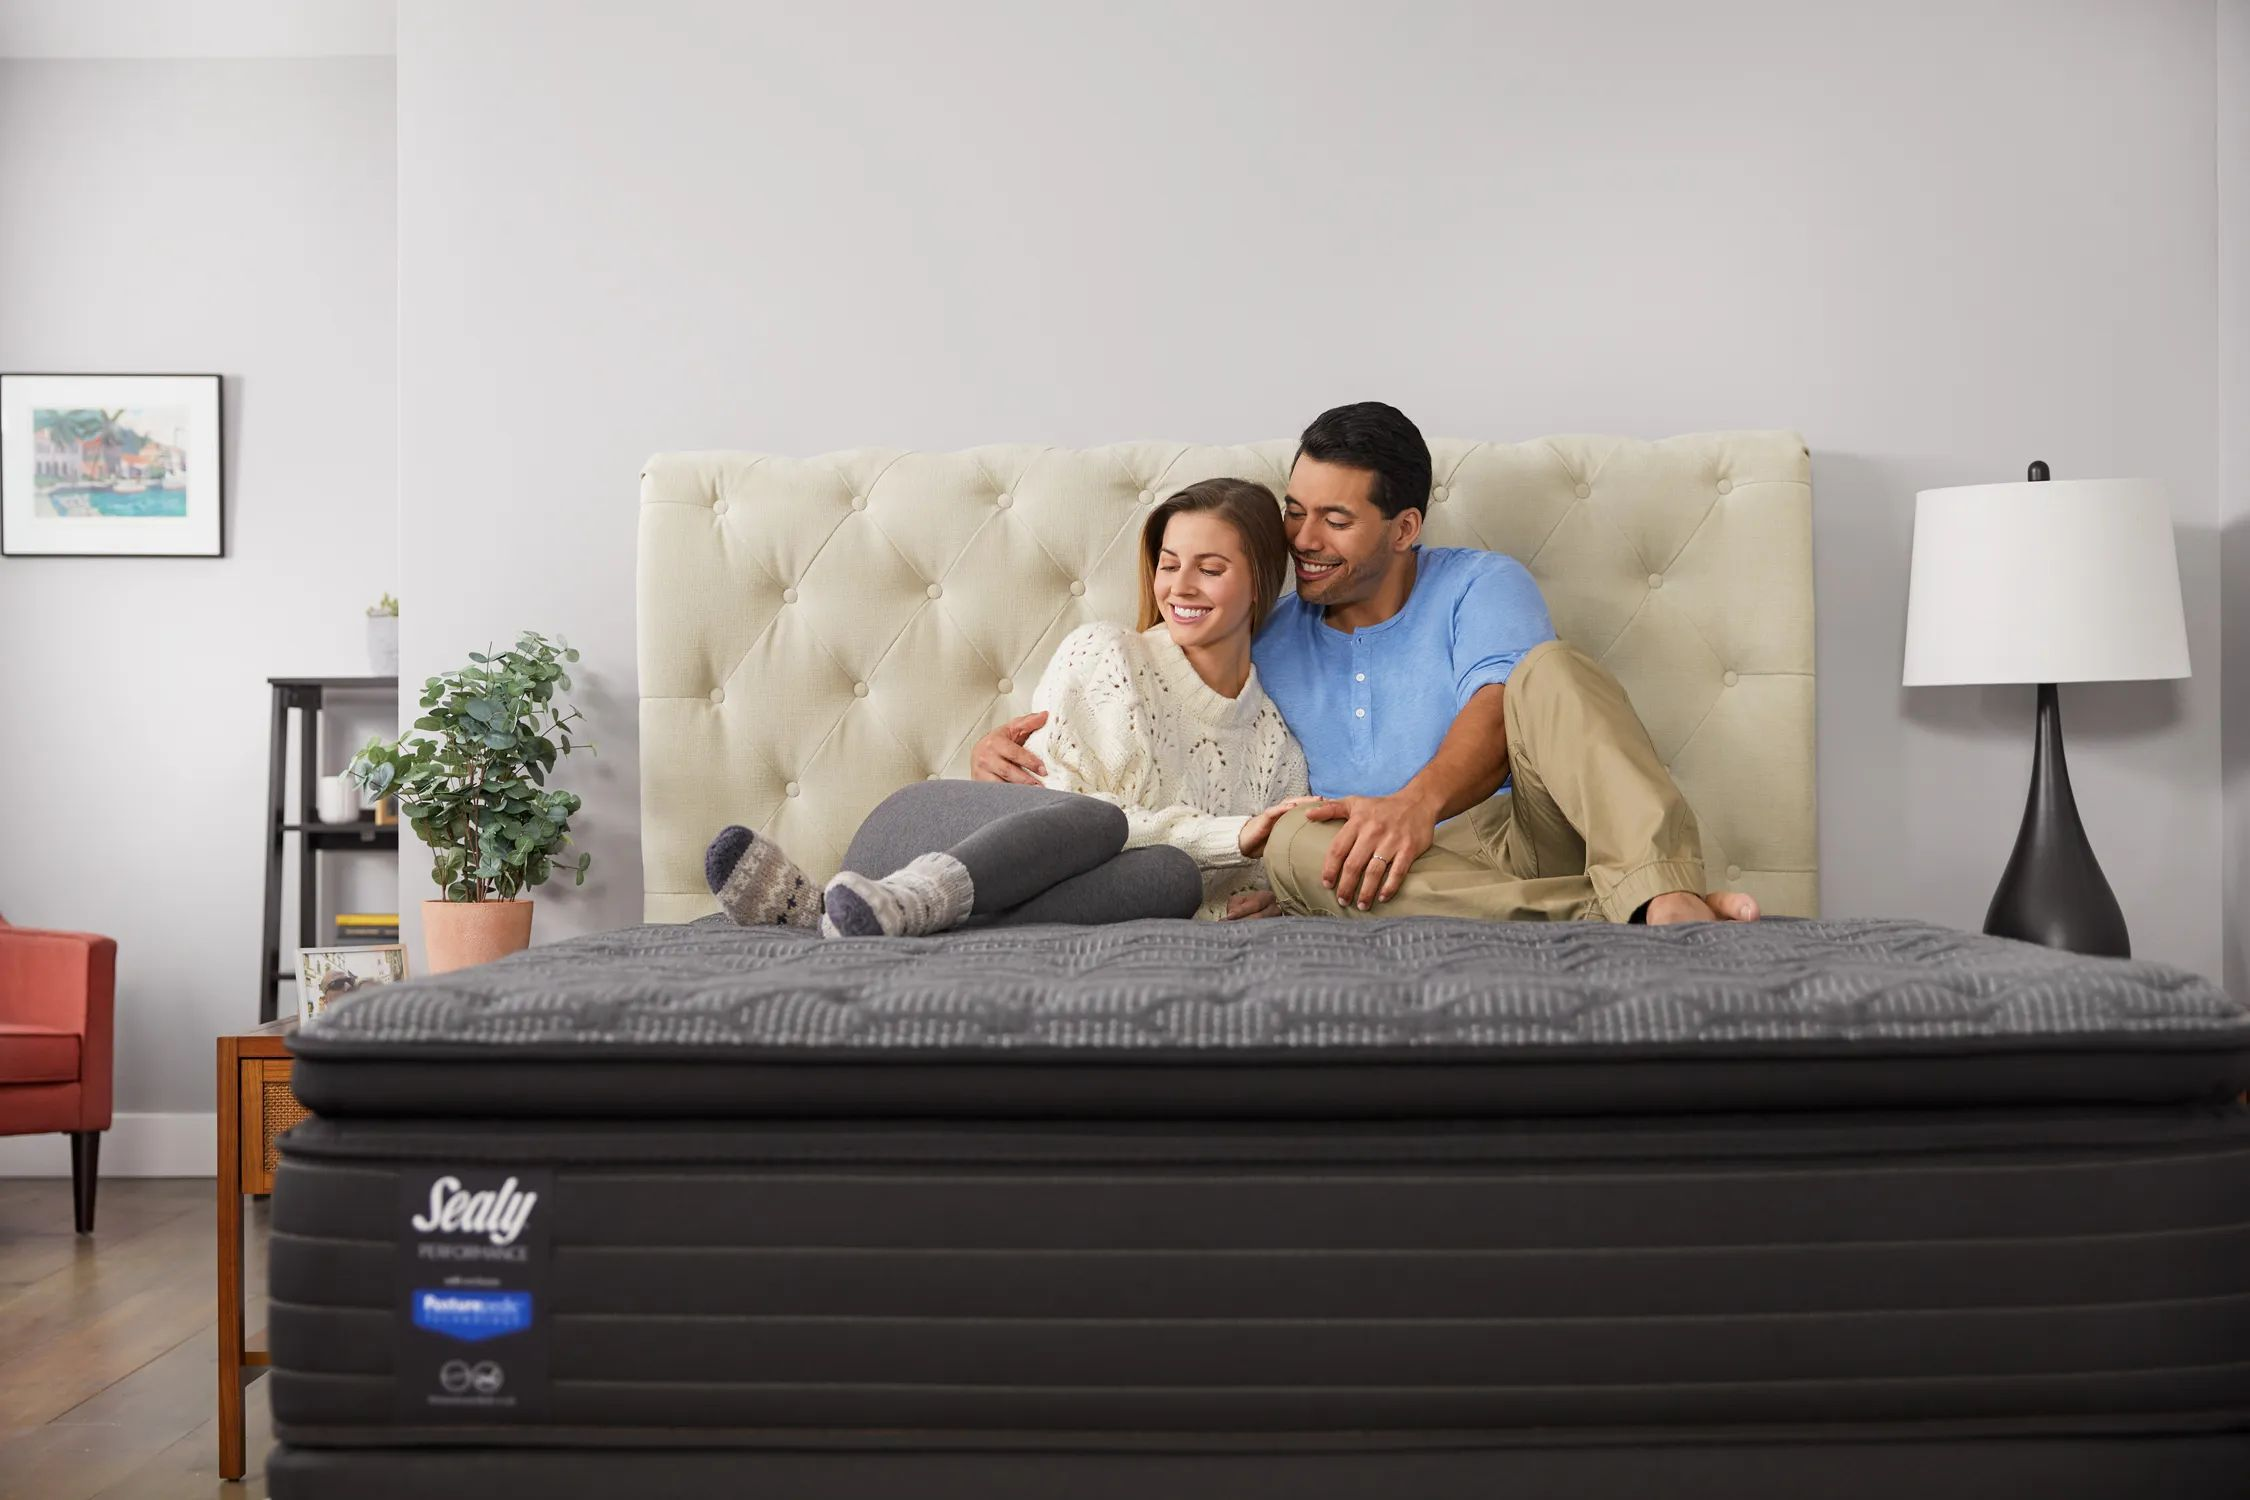 cal king sealy response performance elm avenue plush pillow top 13 5 inch mattress